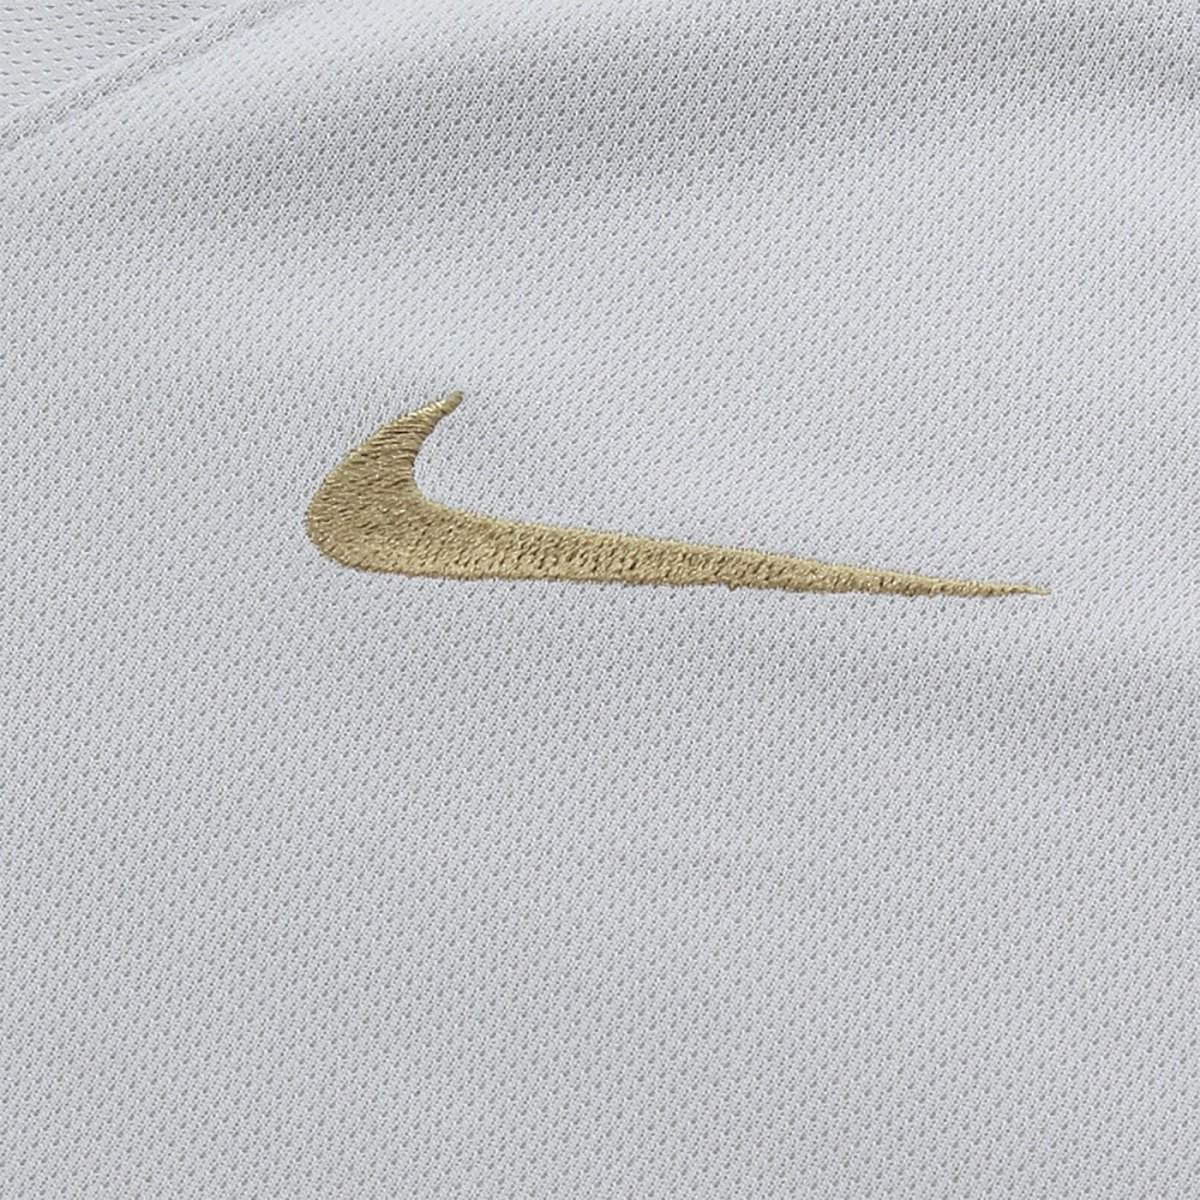 773d869cad729 Camisa Nike Psg Ii 2018 19 Torcedor 919254-073